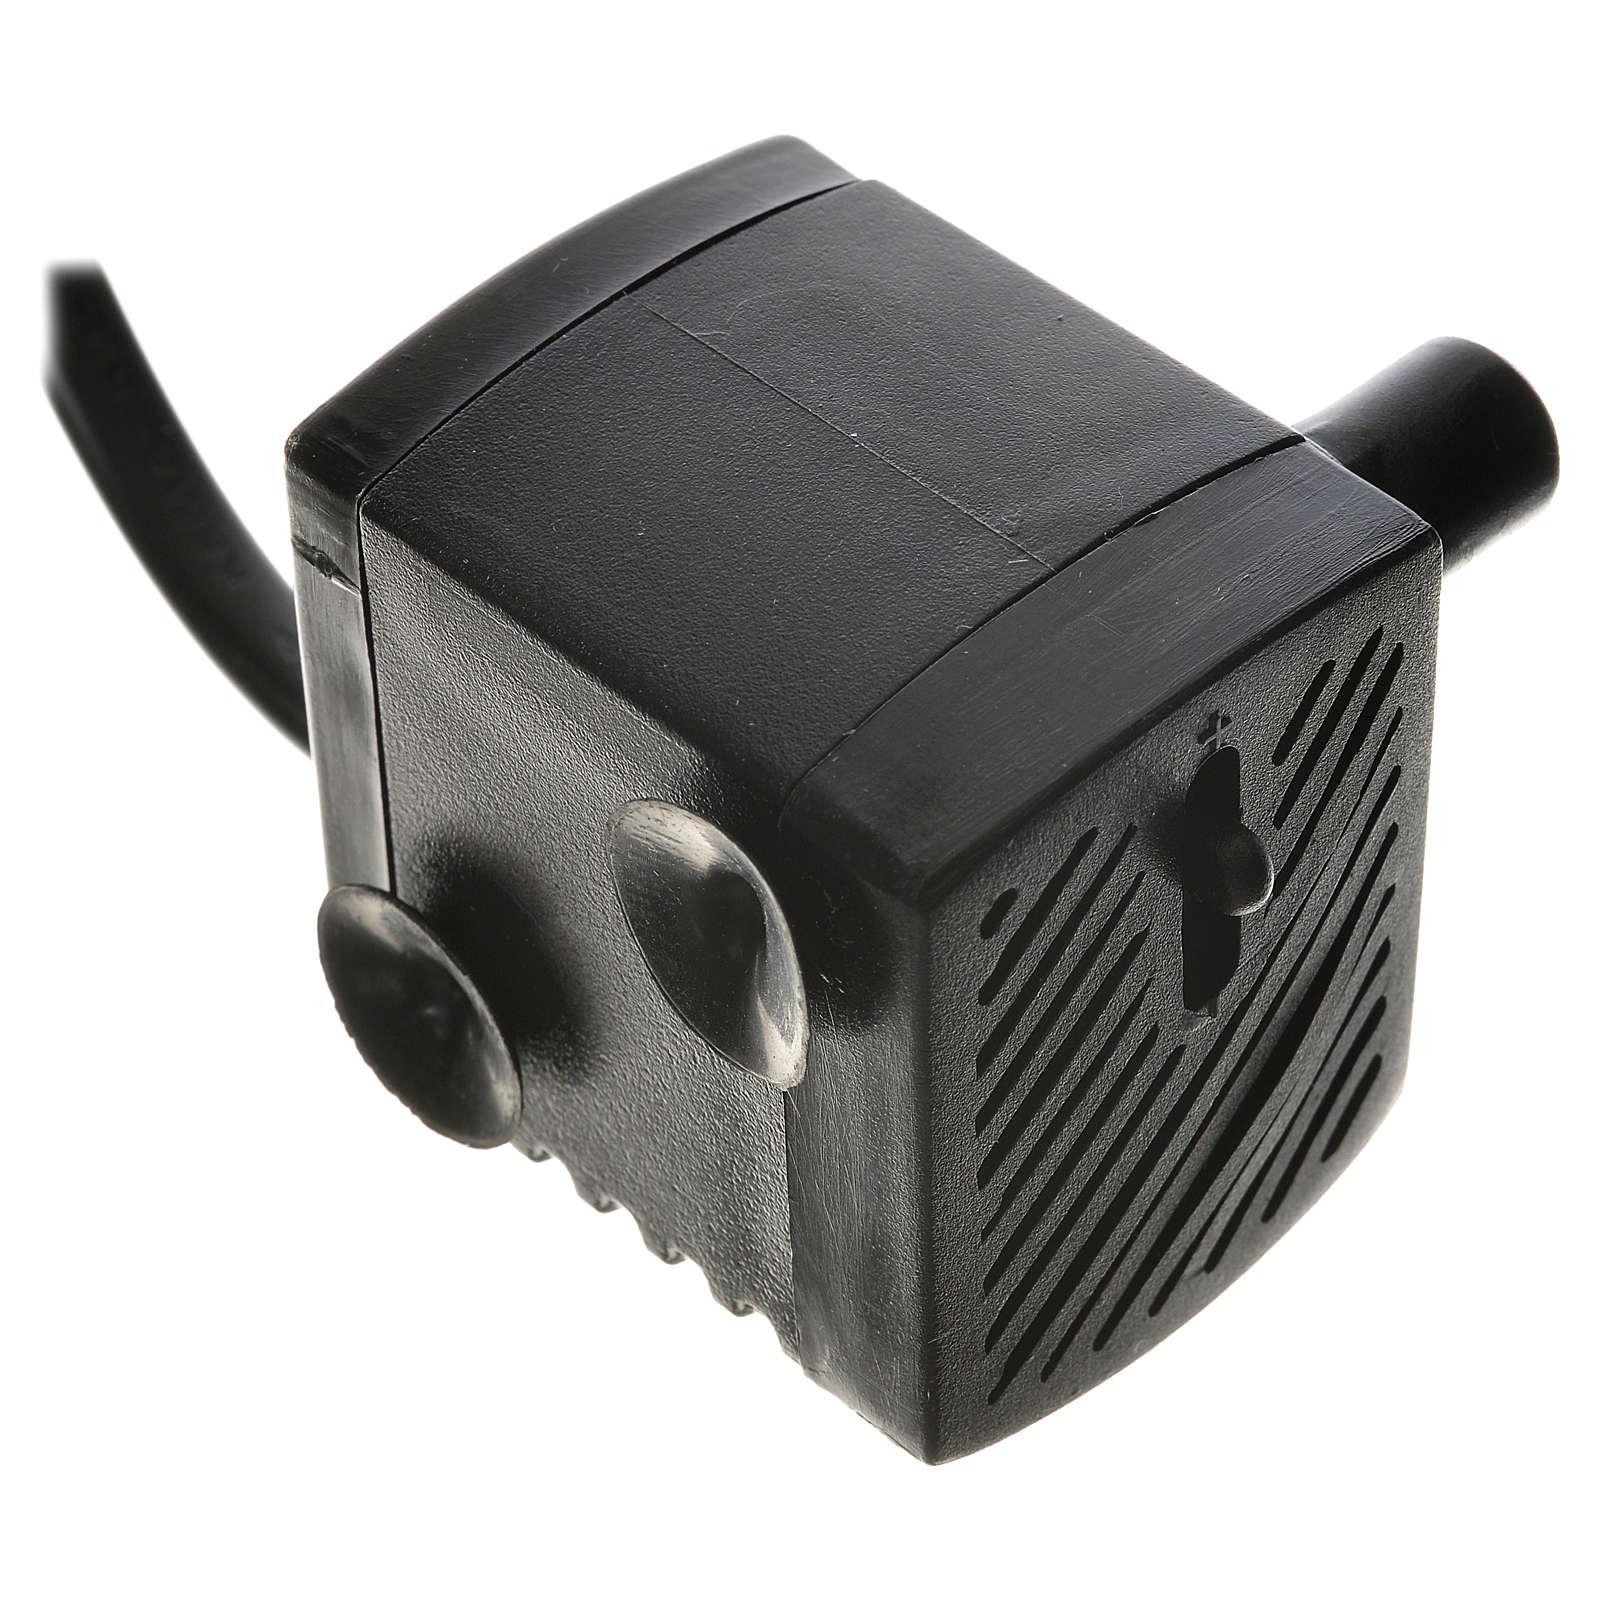 Pompe eau crèche 2,5W 150l/h 4